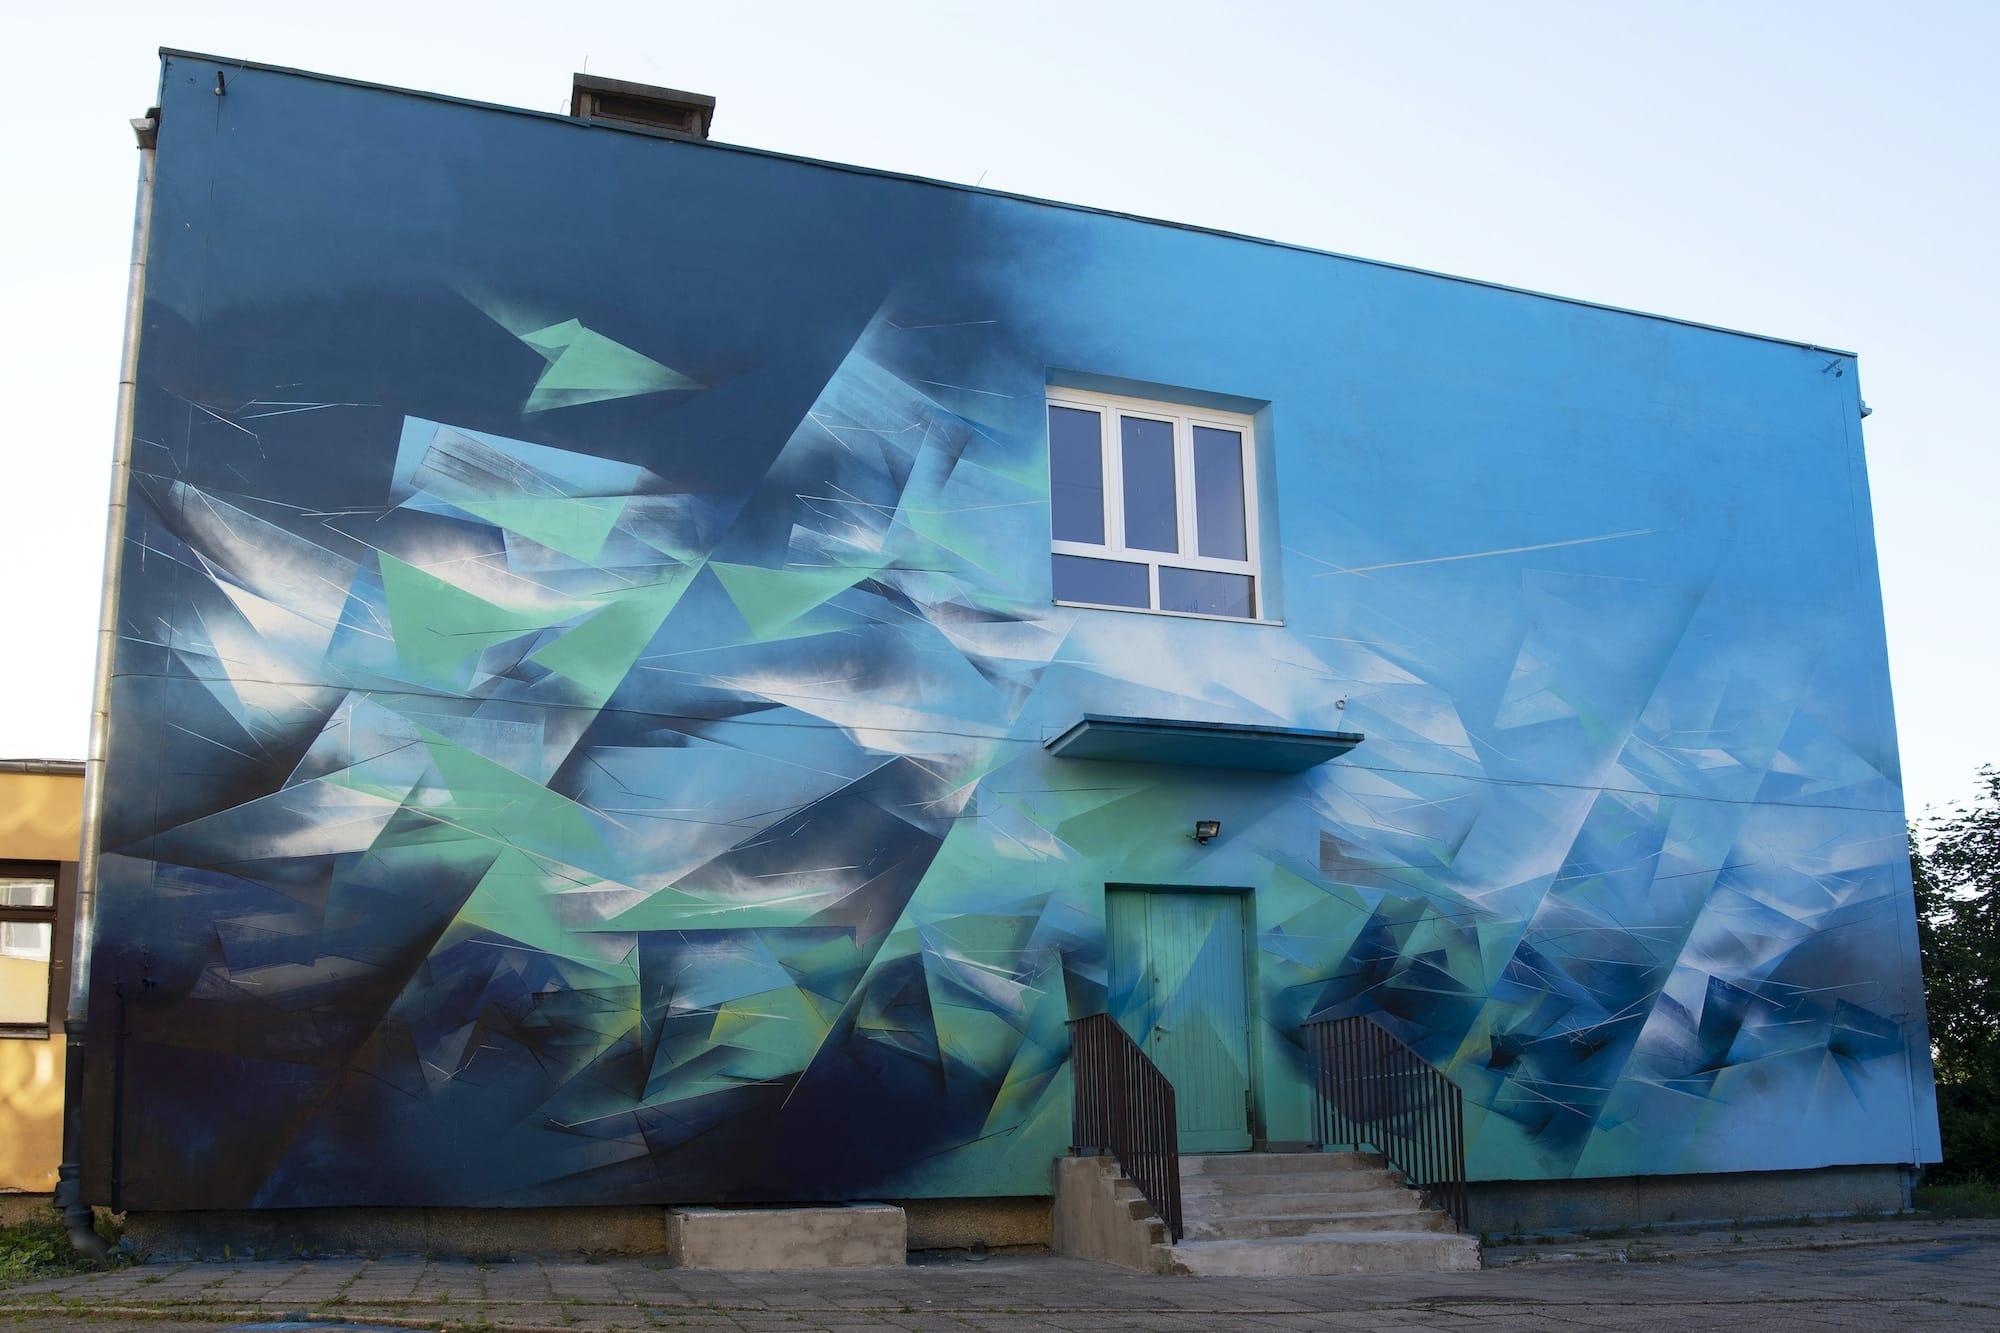 pener mirror land street art 10